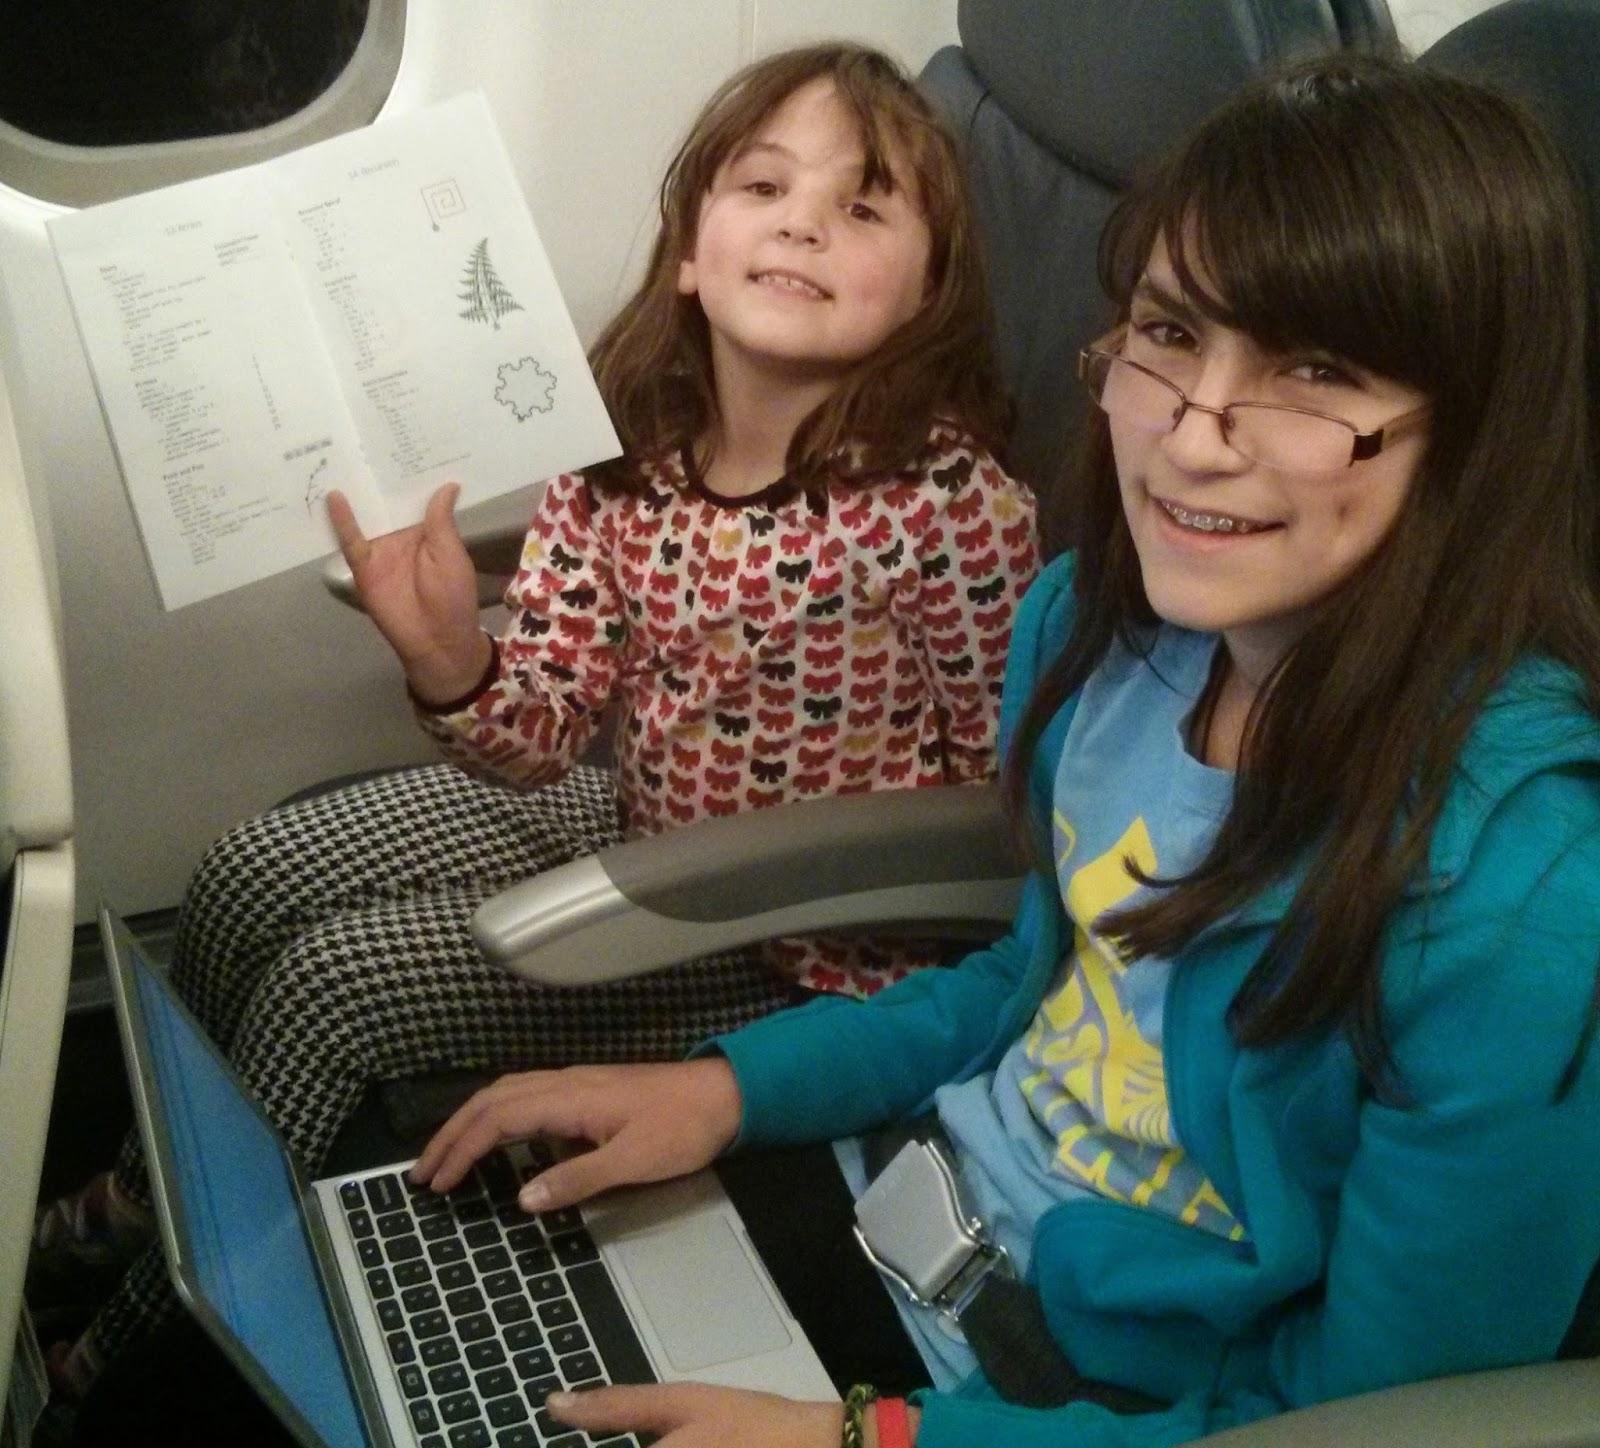 #FutureCoders: Inspiring the next generation of female coders